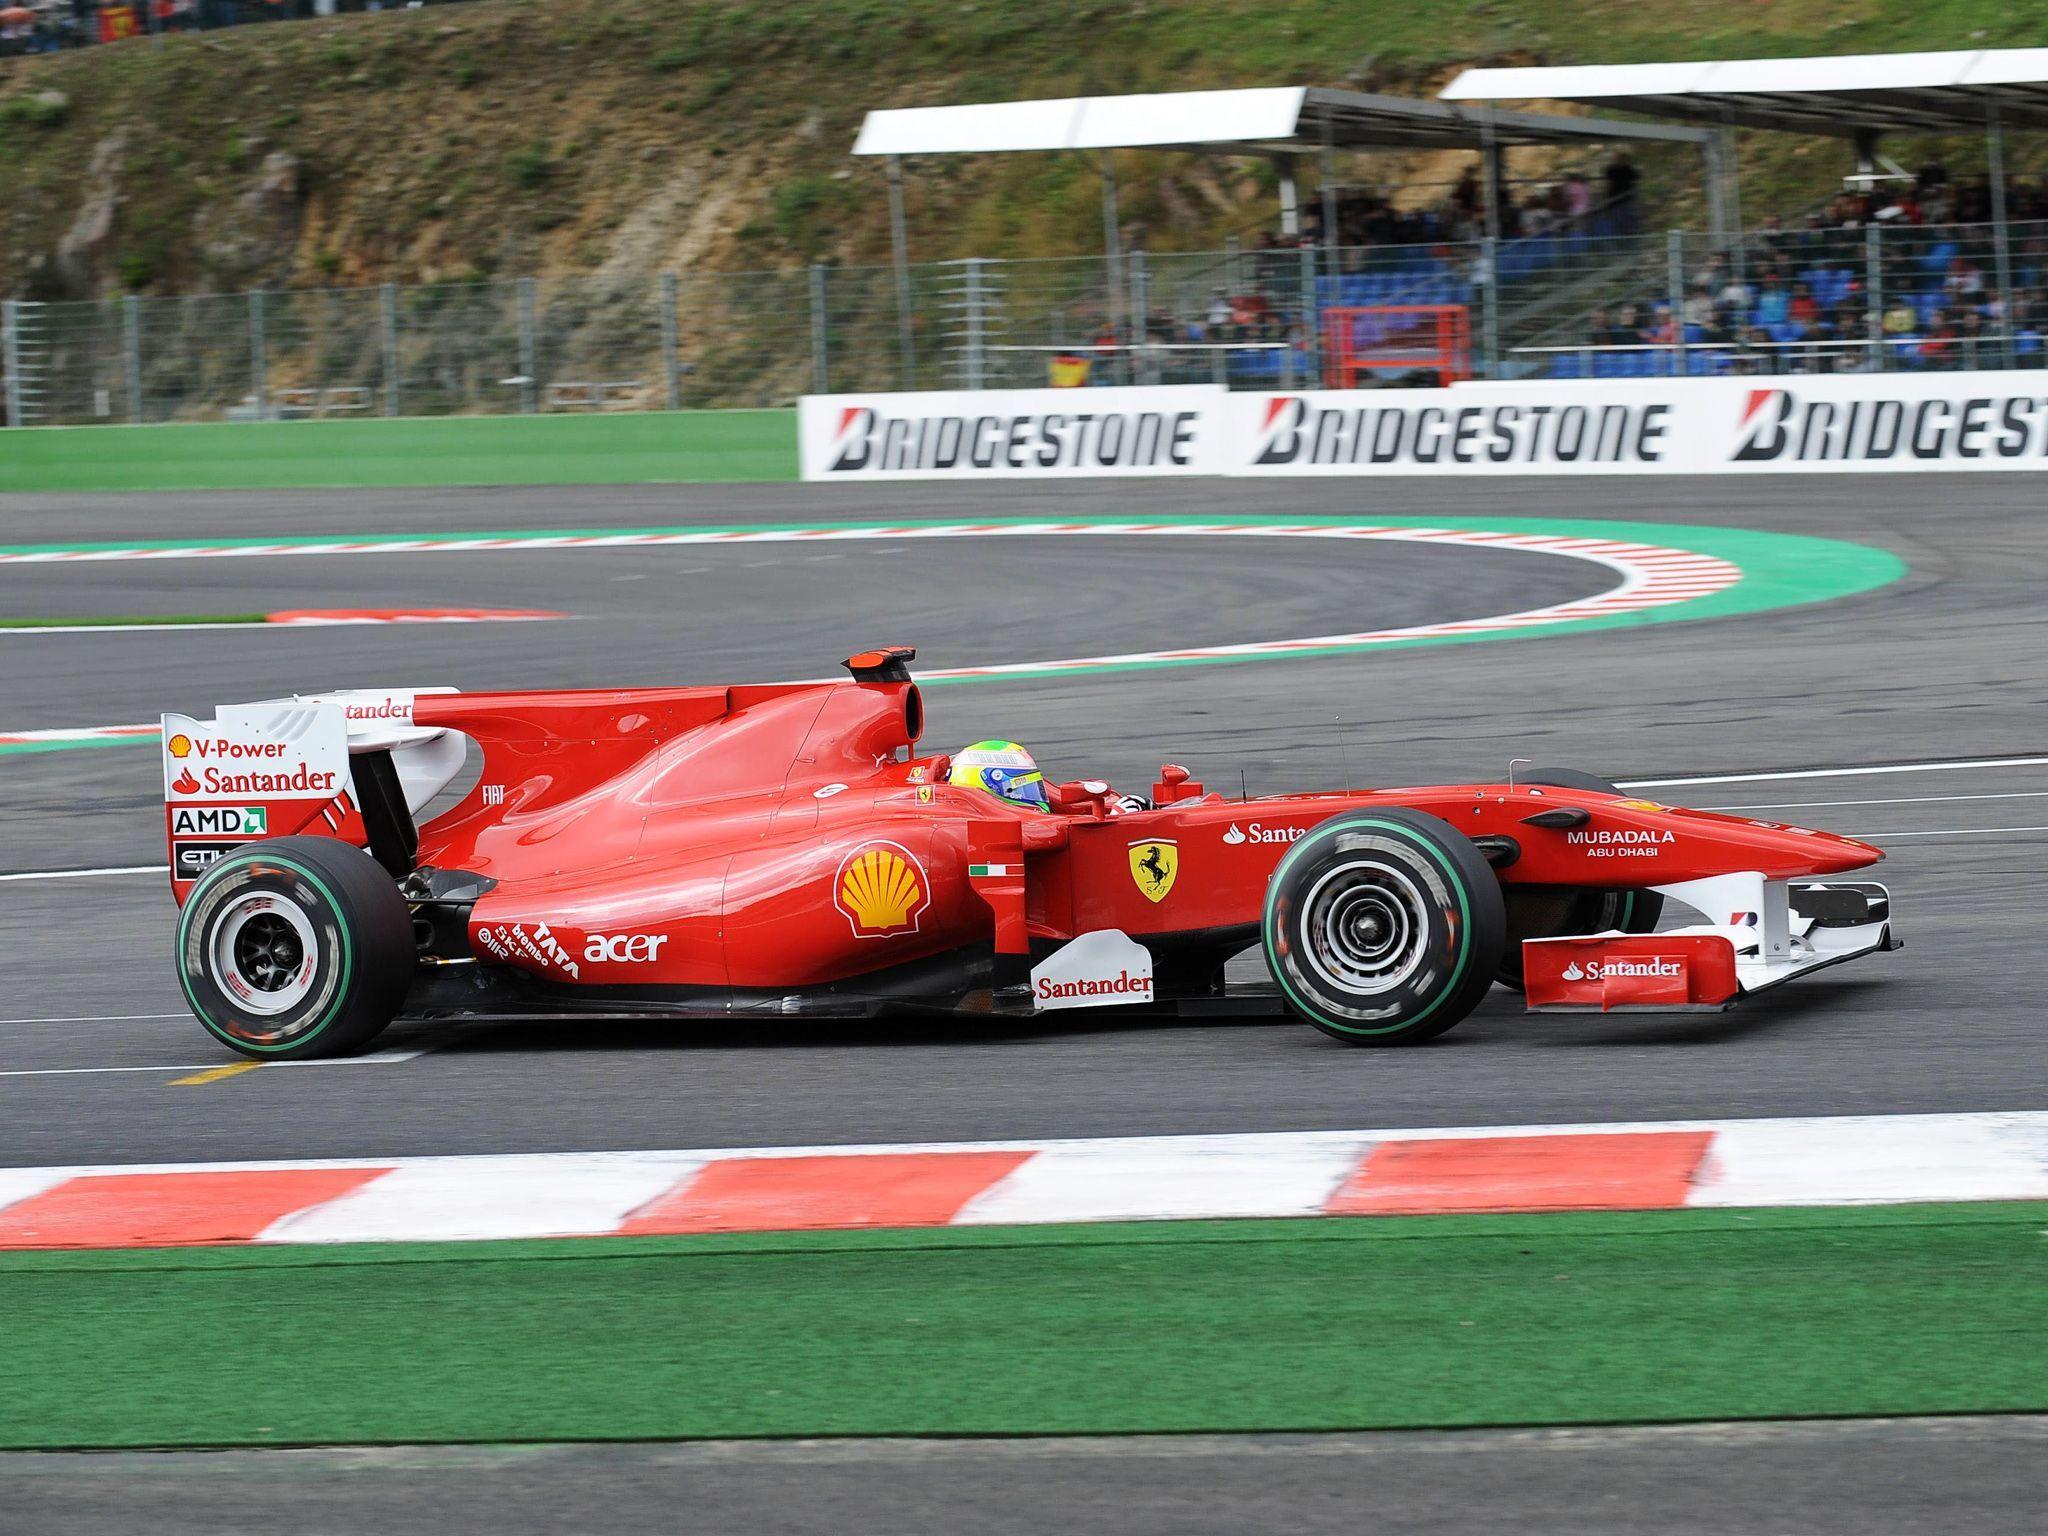 2010 Ferrari F10 | Racing | Pinterest | Ferrari, F1 and Ferrari f1